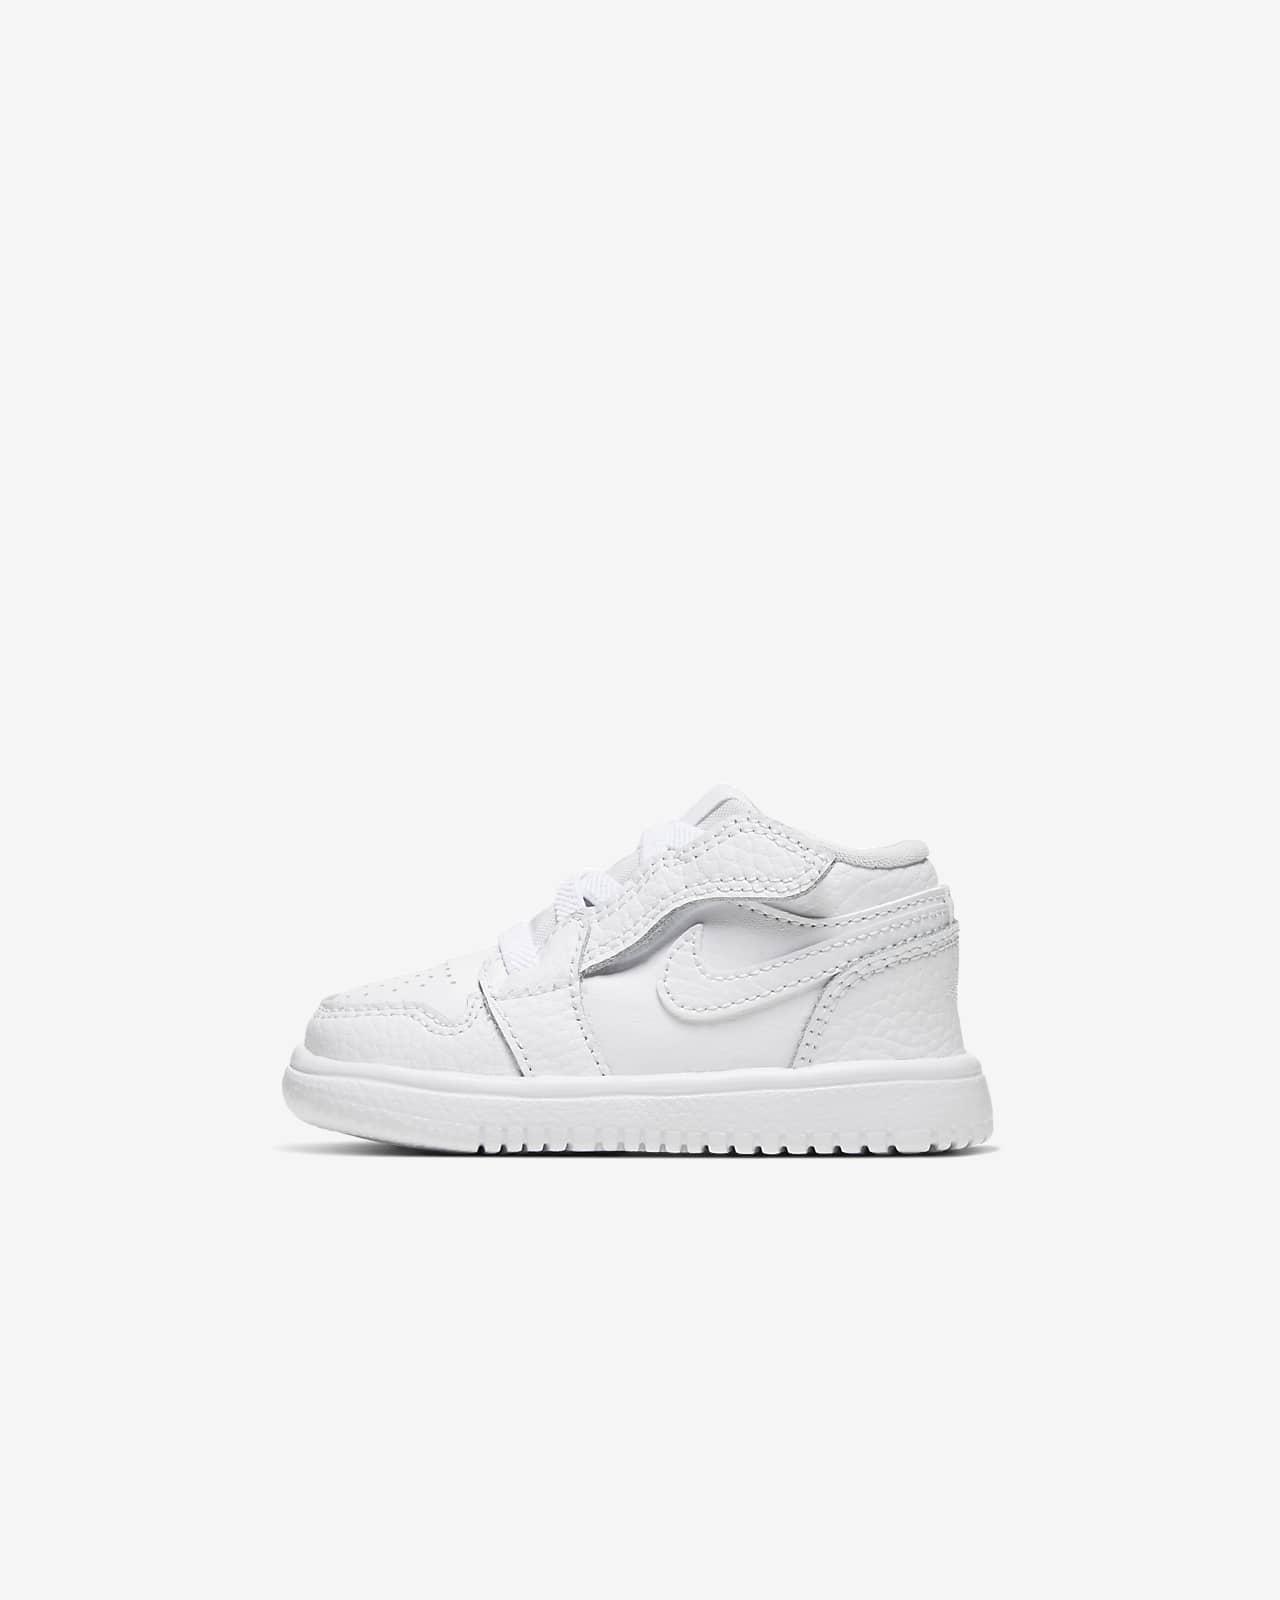 Jordan 1 Low Alt Baby/Toddler Shoes